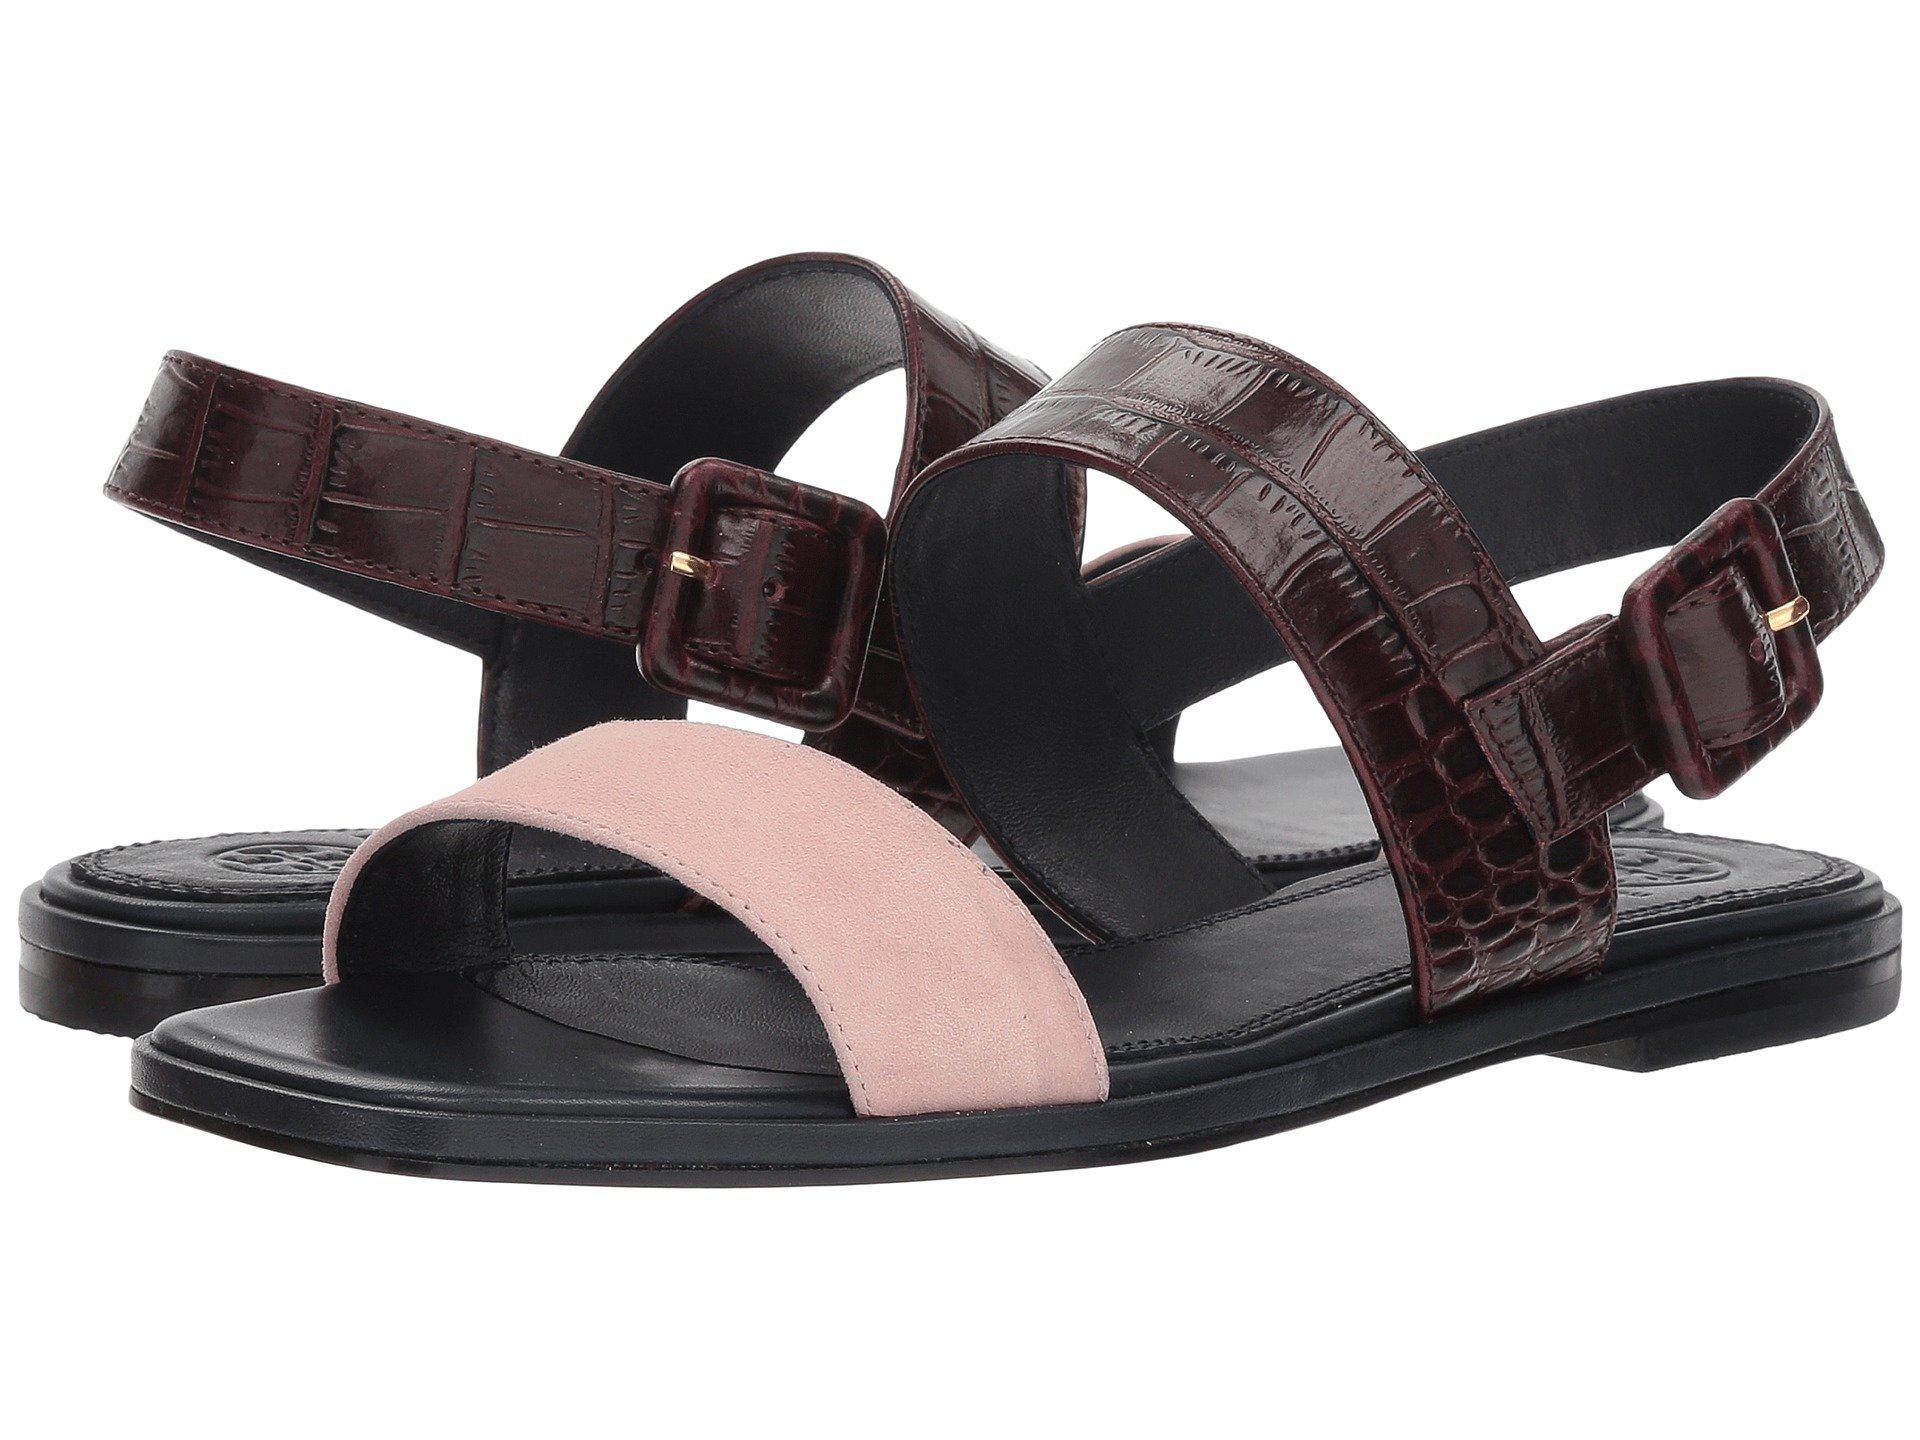 f003bdf3bdc Lyst - Tory Burch Delaney Color-block Flat Sandals - Save 66%